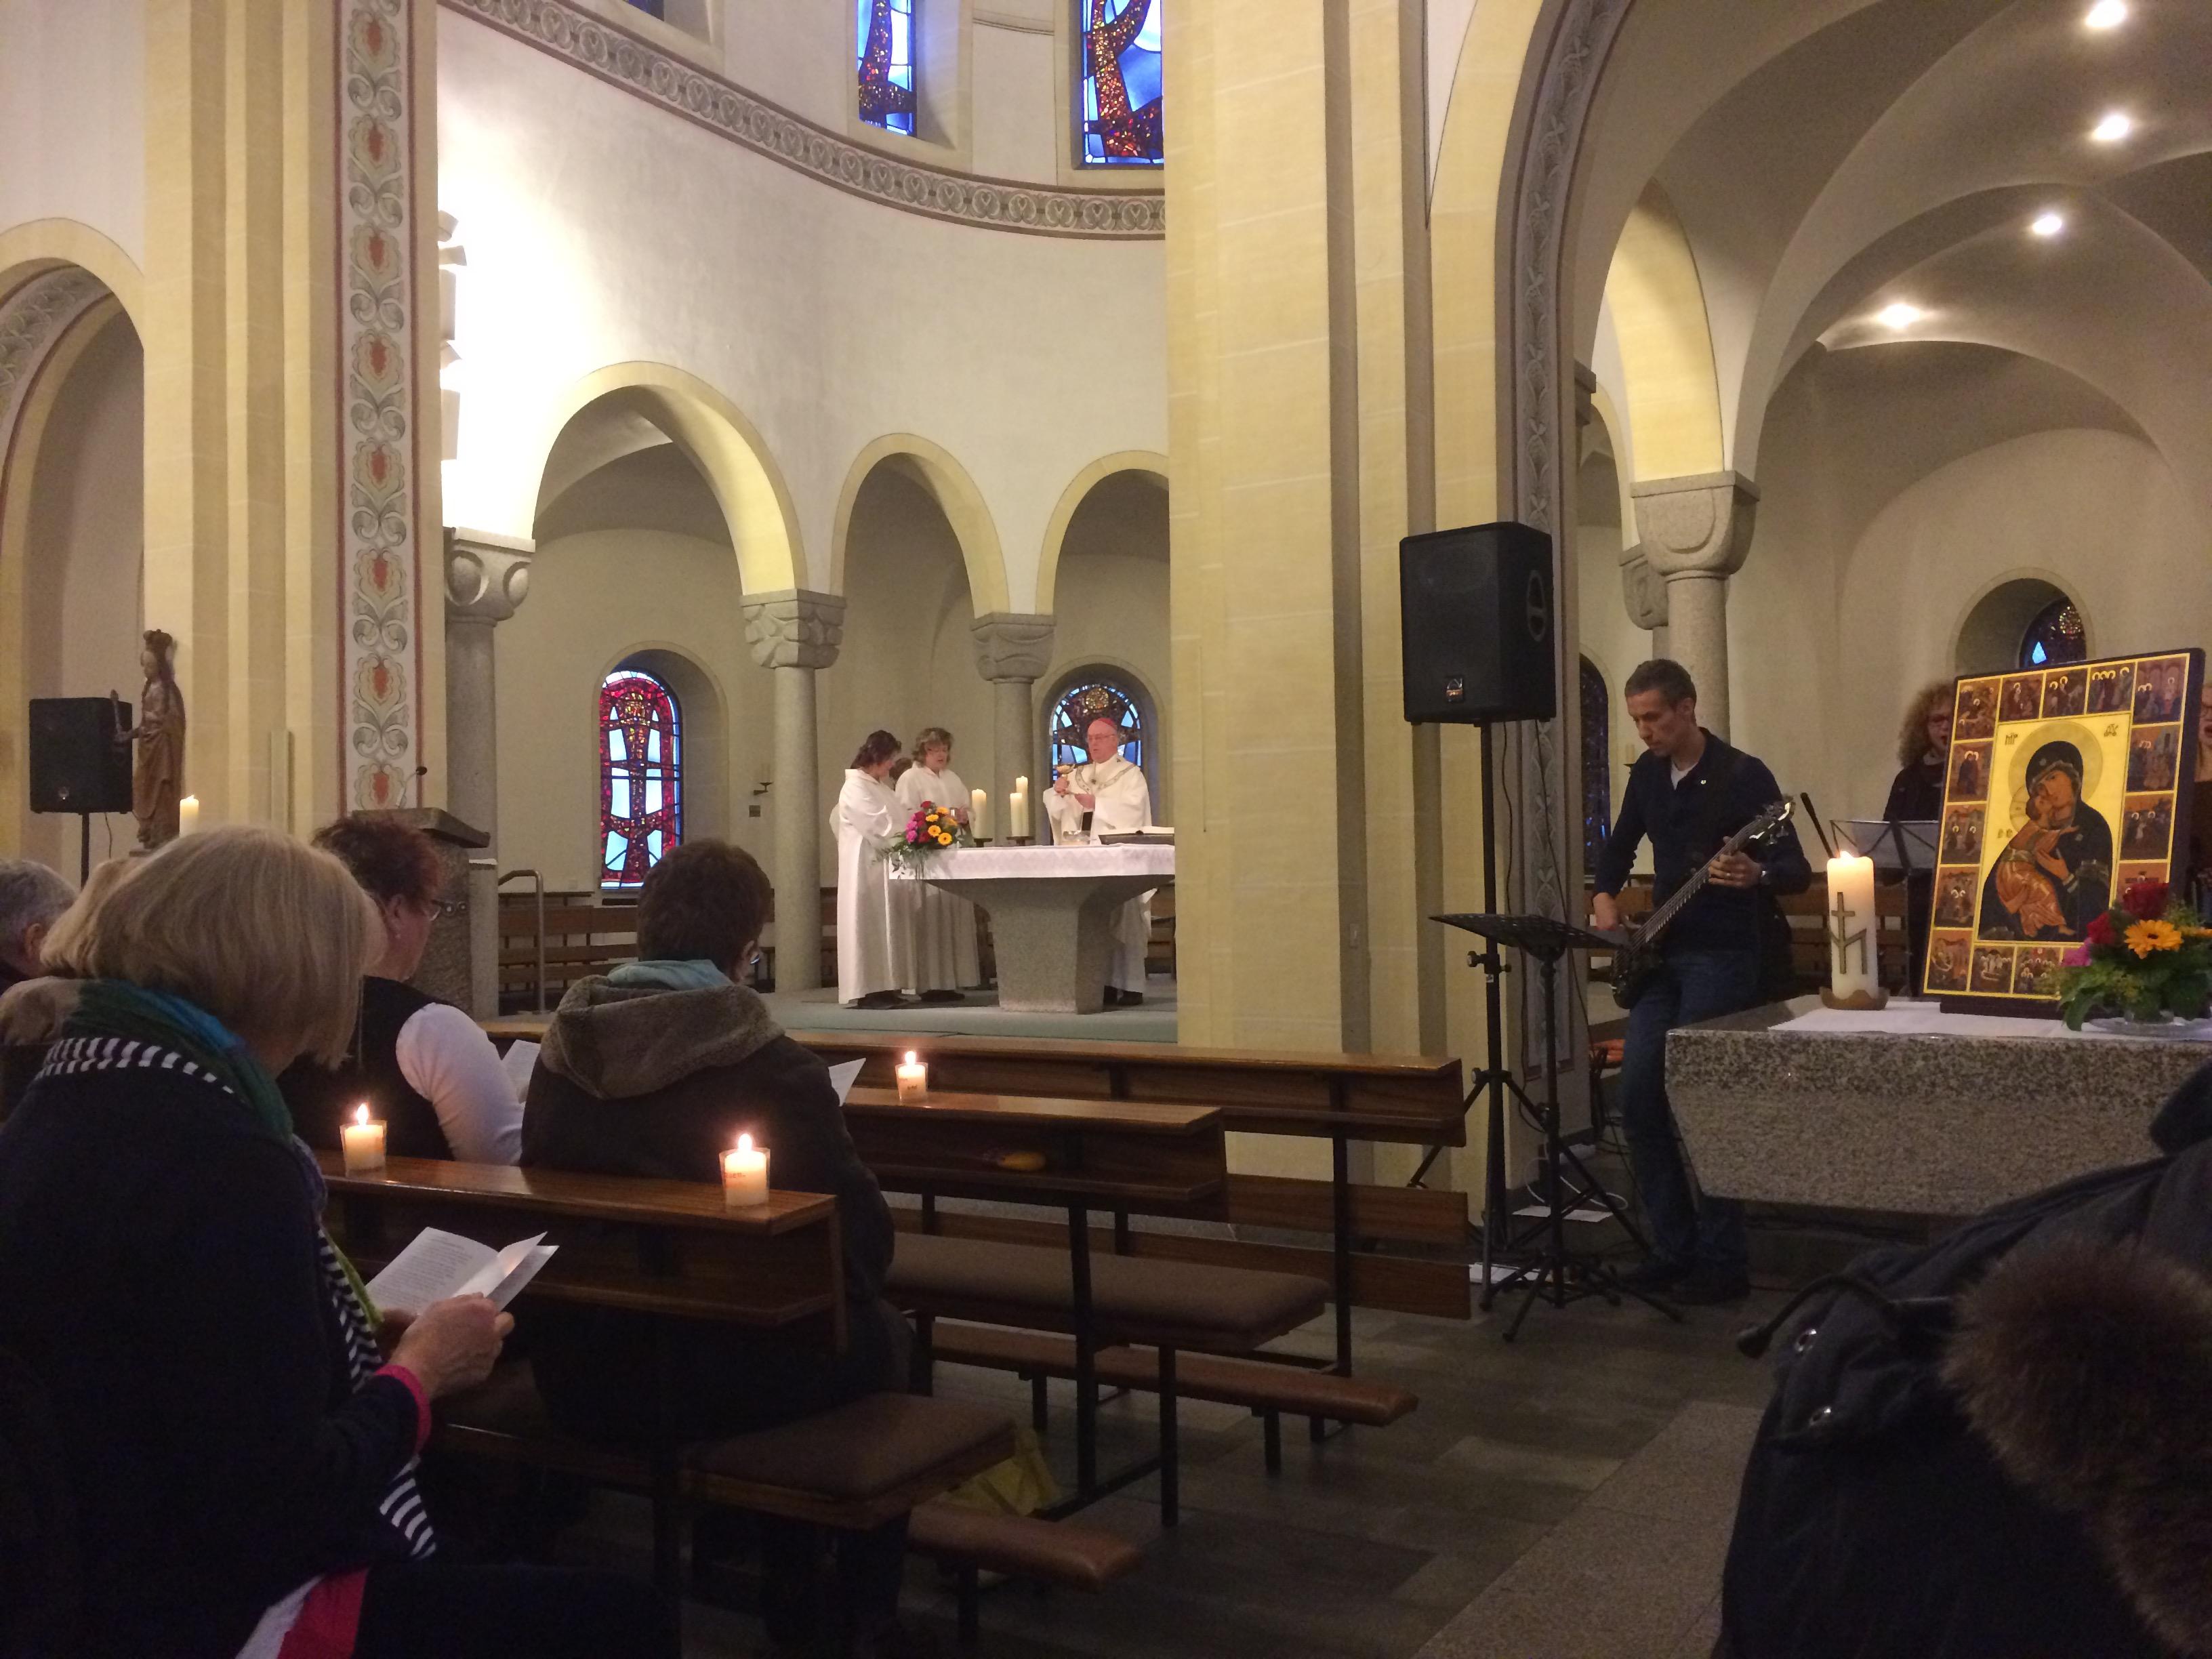 Kirchenband spiritus@laurentius 100 Jahre kfd Diözesanverband Paderborn